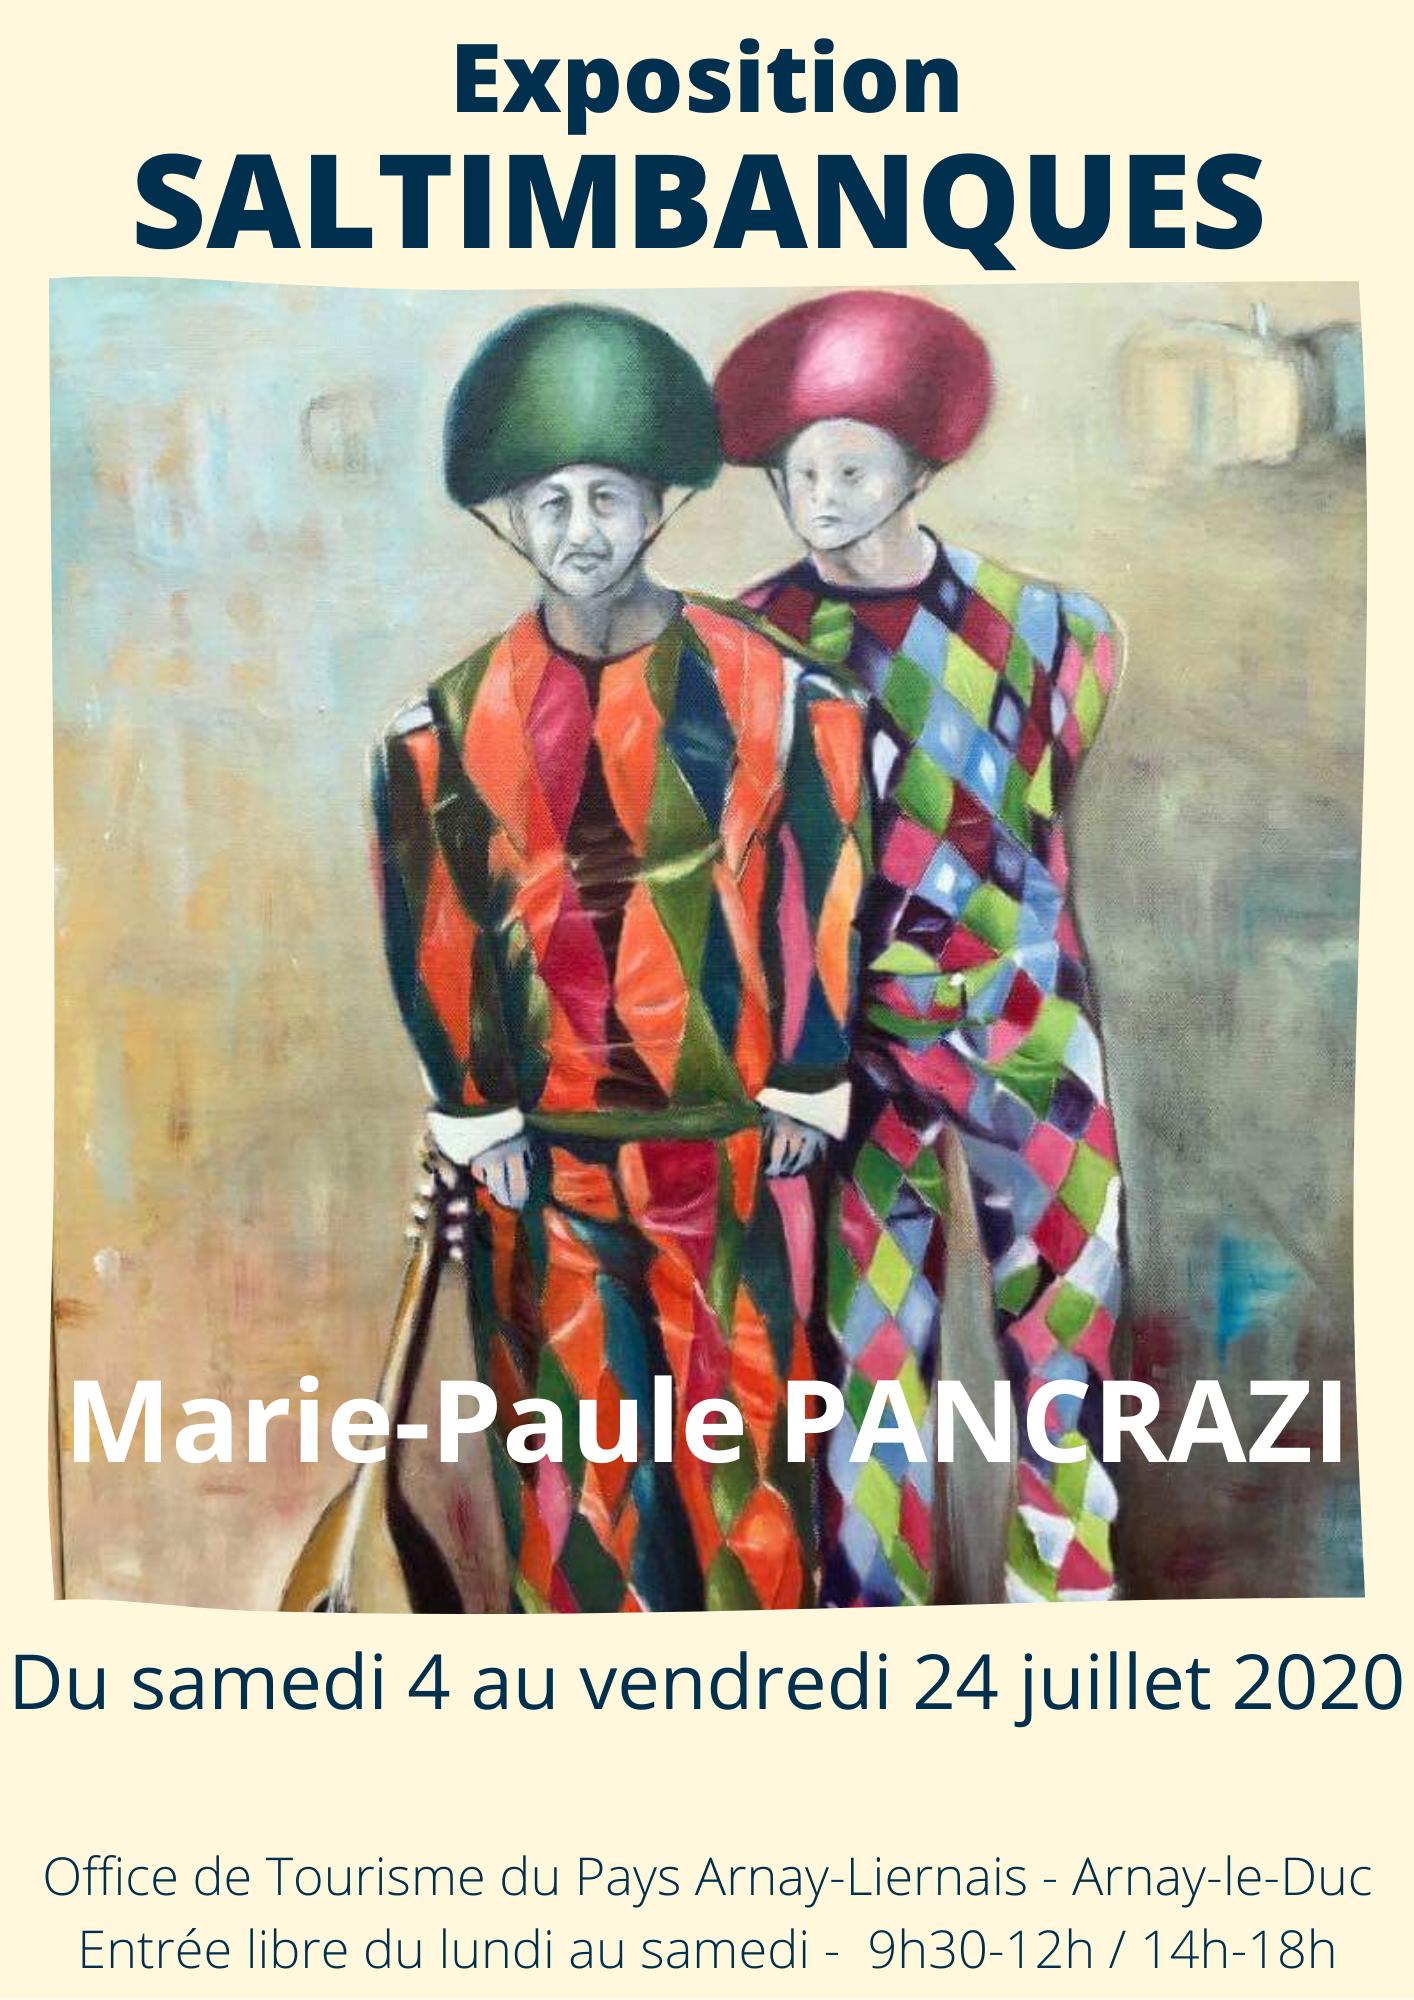 exposition-mppancrazi-juillet-2020 (2)